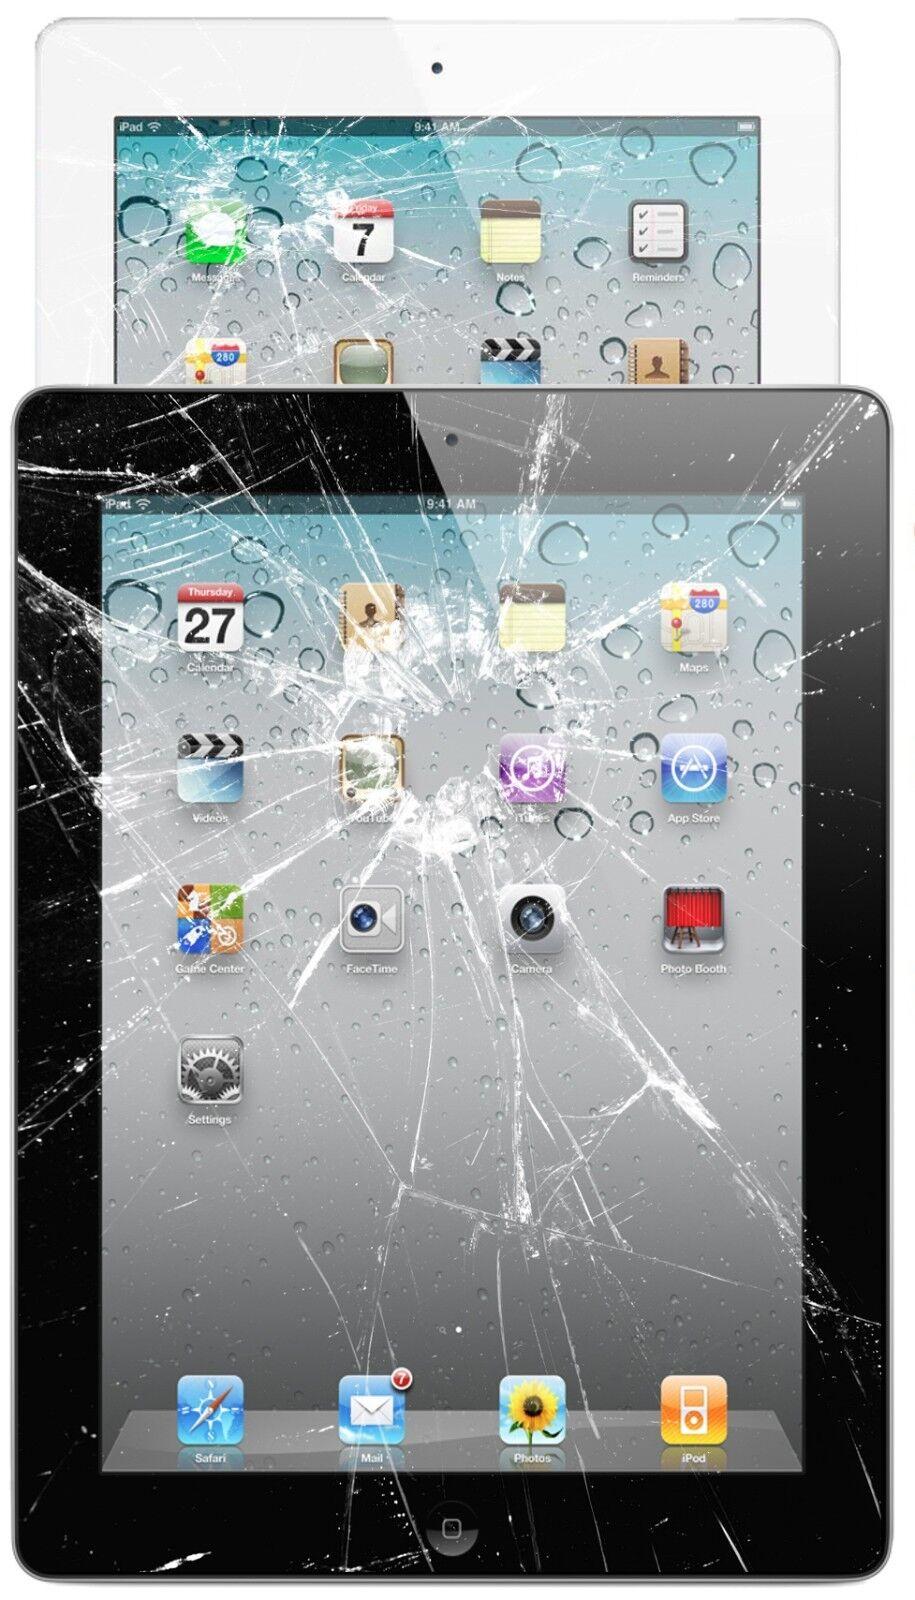 Digitizer Glass Screen Replacement Repair Service For Apple iPad Mini 1 2